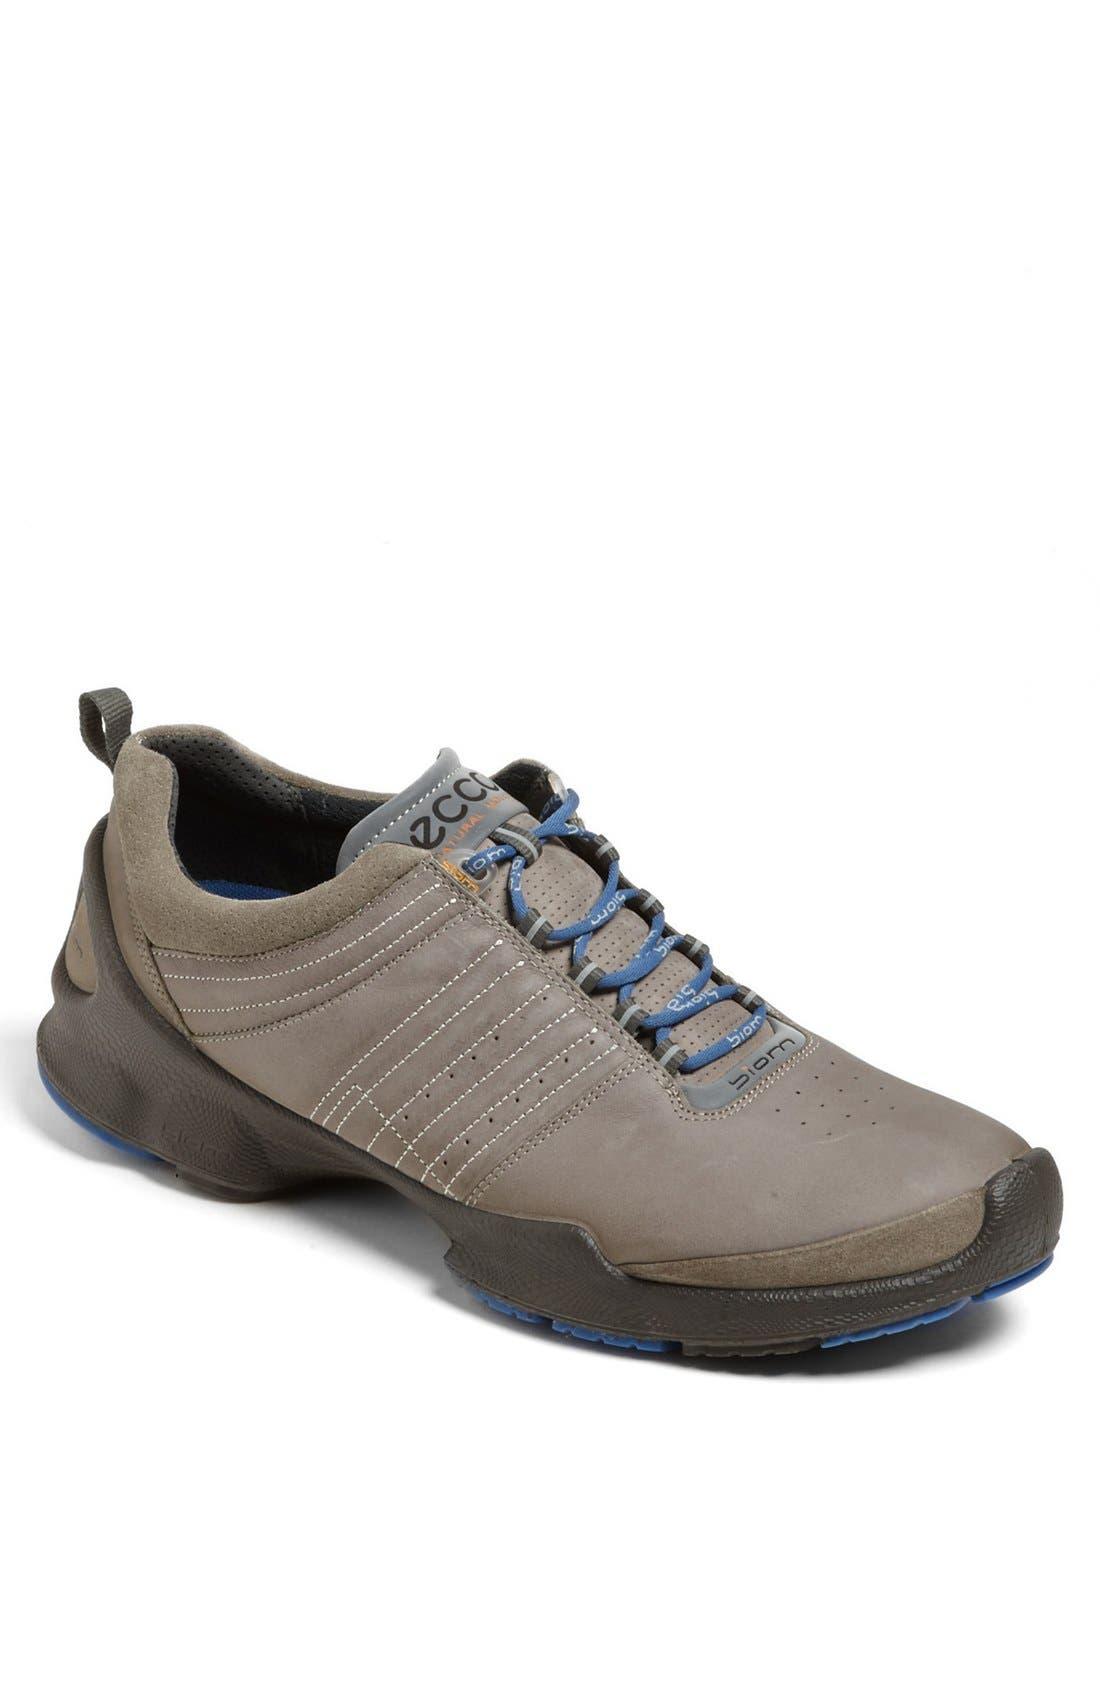 Main Image - ECCO 'Biom Training 1.1' Fitness Shoe (Men)